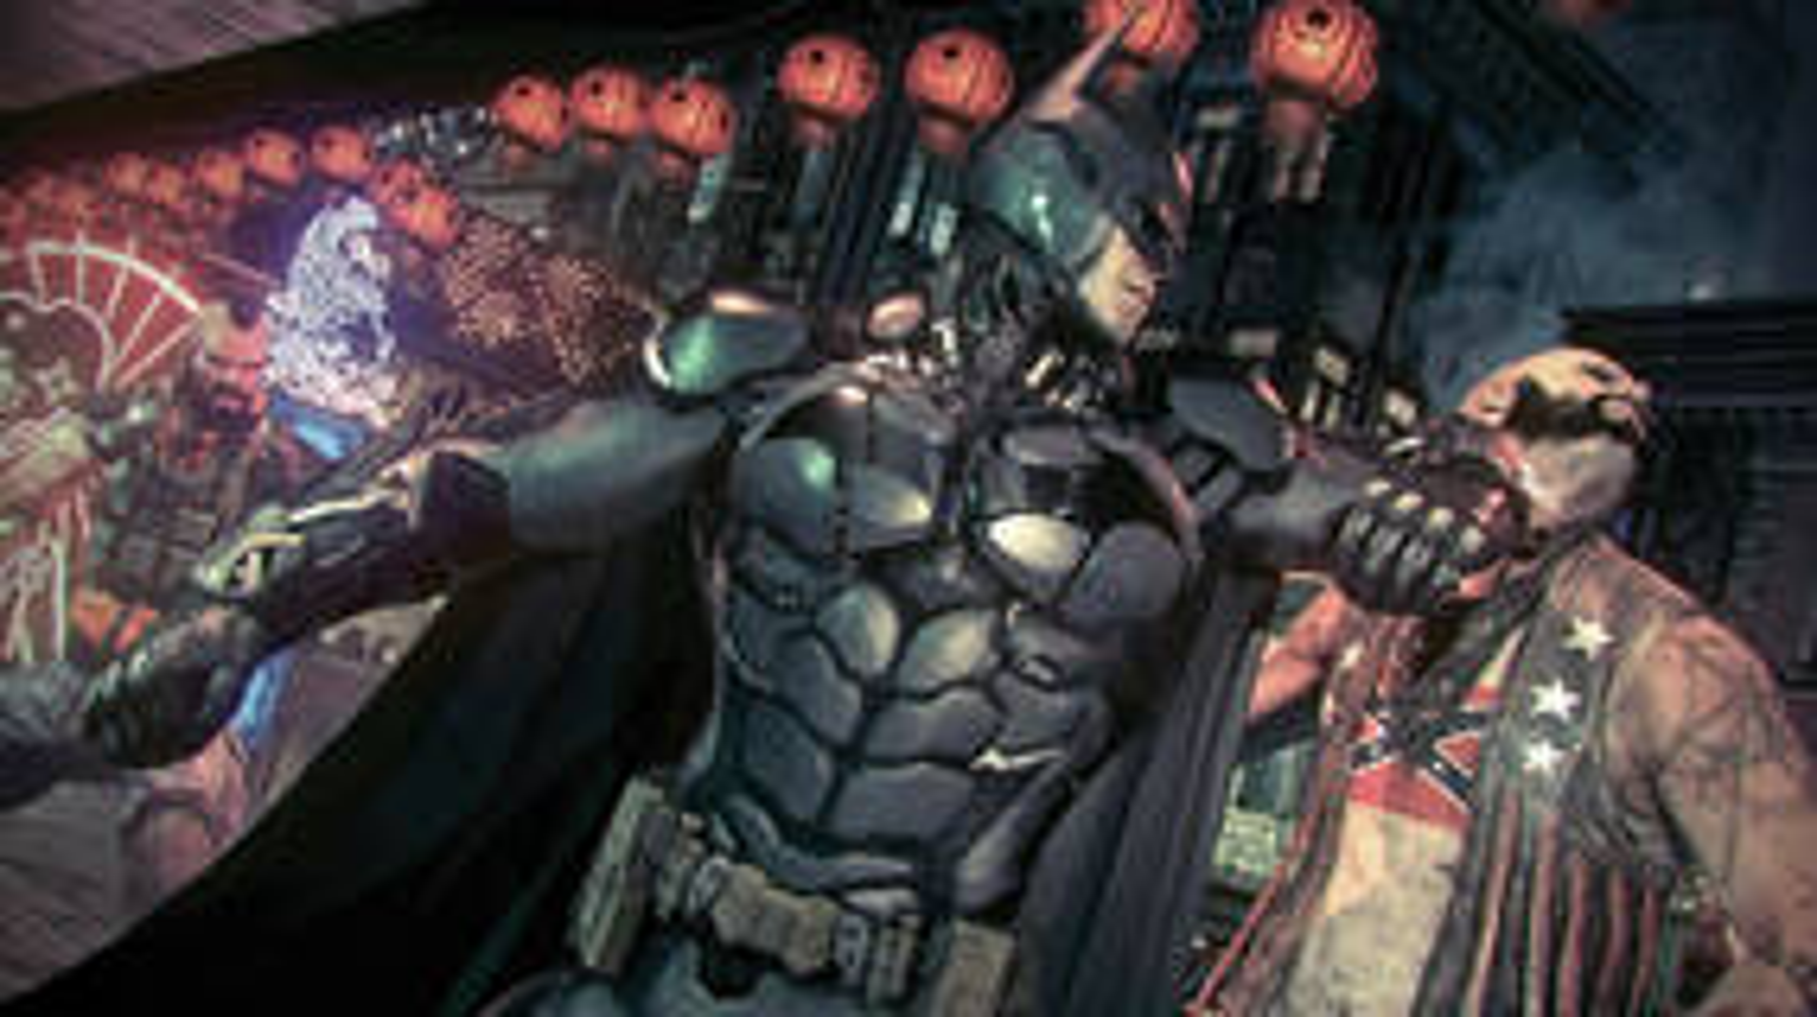 Image for Batman: Arkham Knight PC won't be fixed till September - report